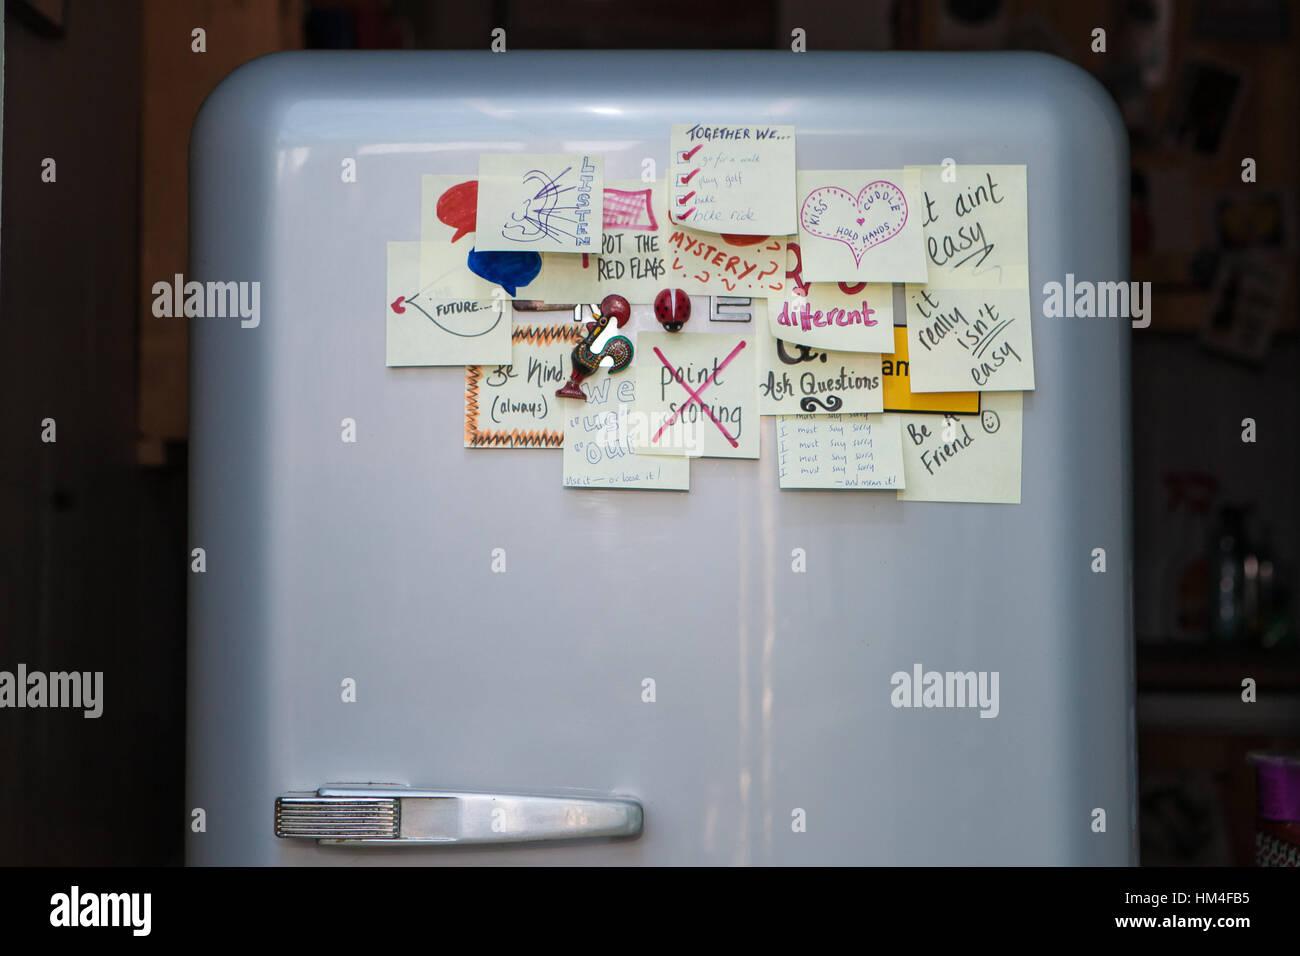 Smeg Kühlschrank Schiefer : Smeg kühlschrank stockfotos smeg kühlschrank bilder alamy